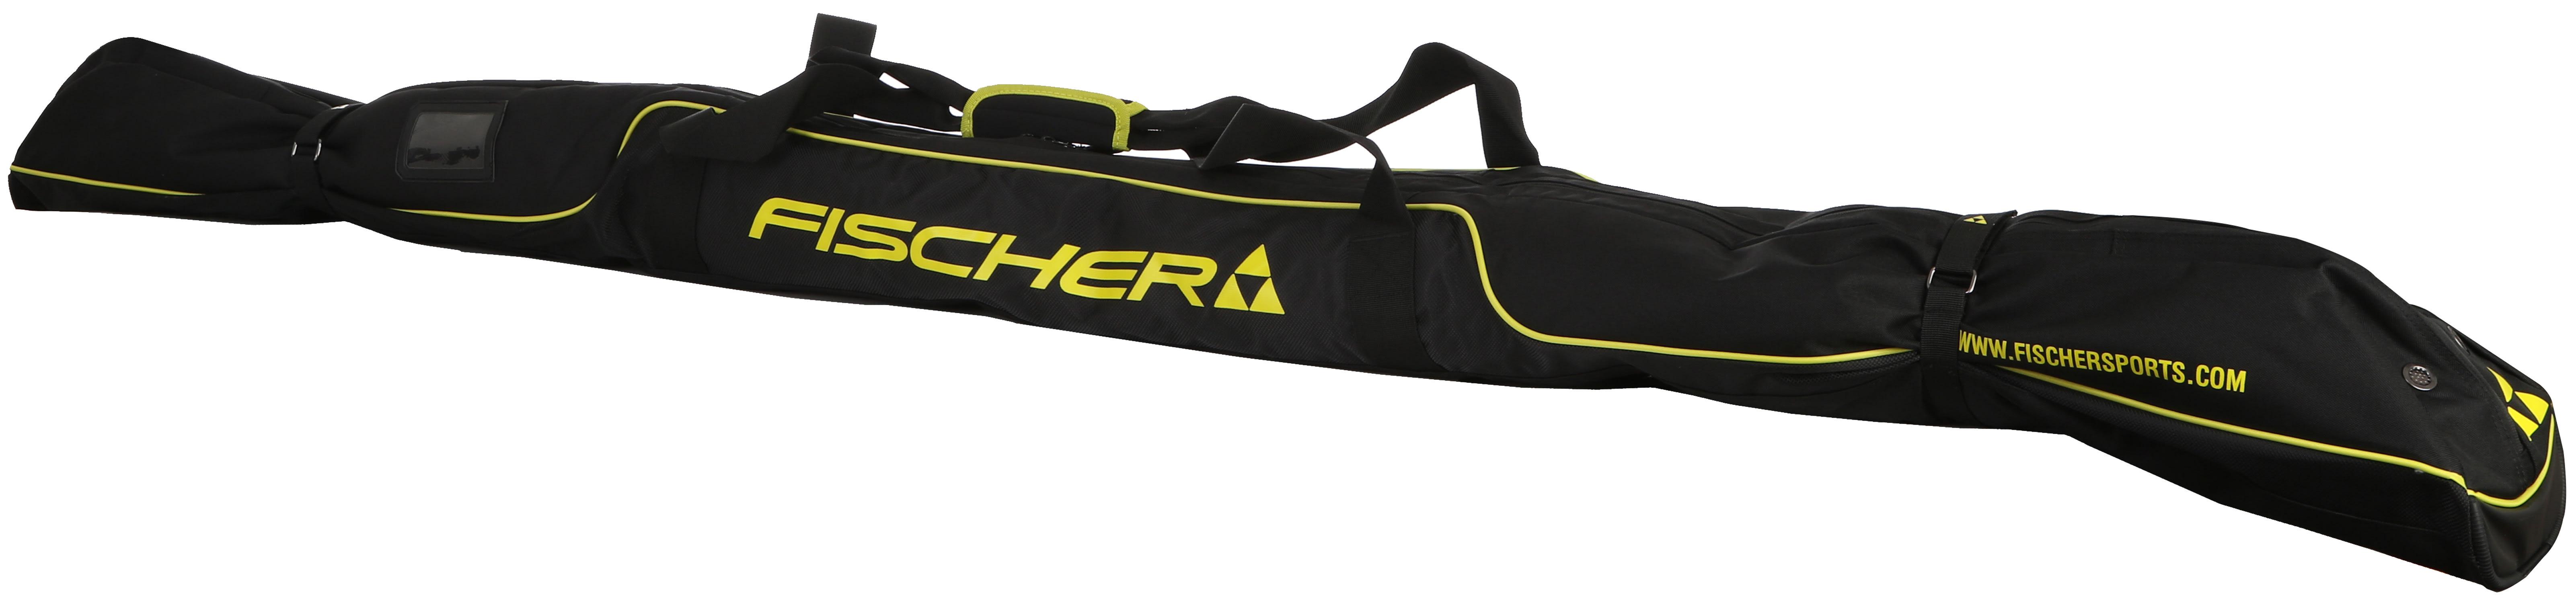 Fischer 3 Pair Performance Xc Ski Bag Thumbnail 1